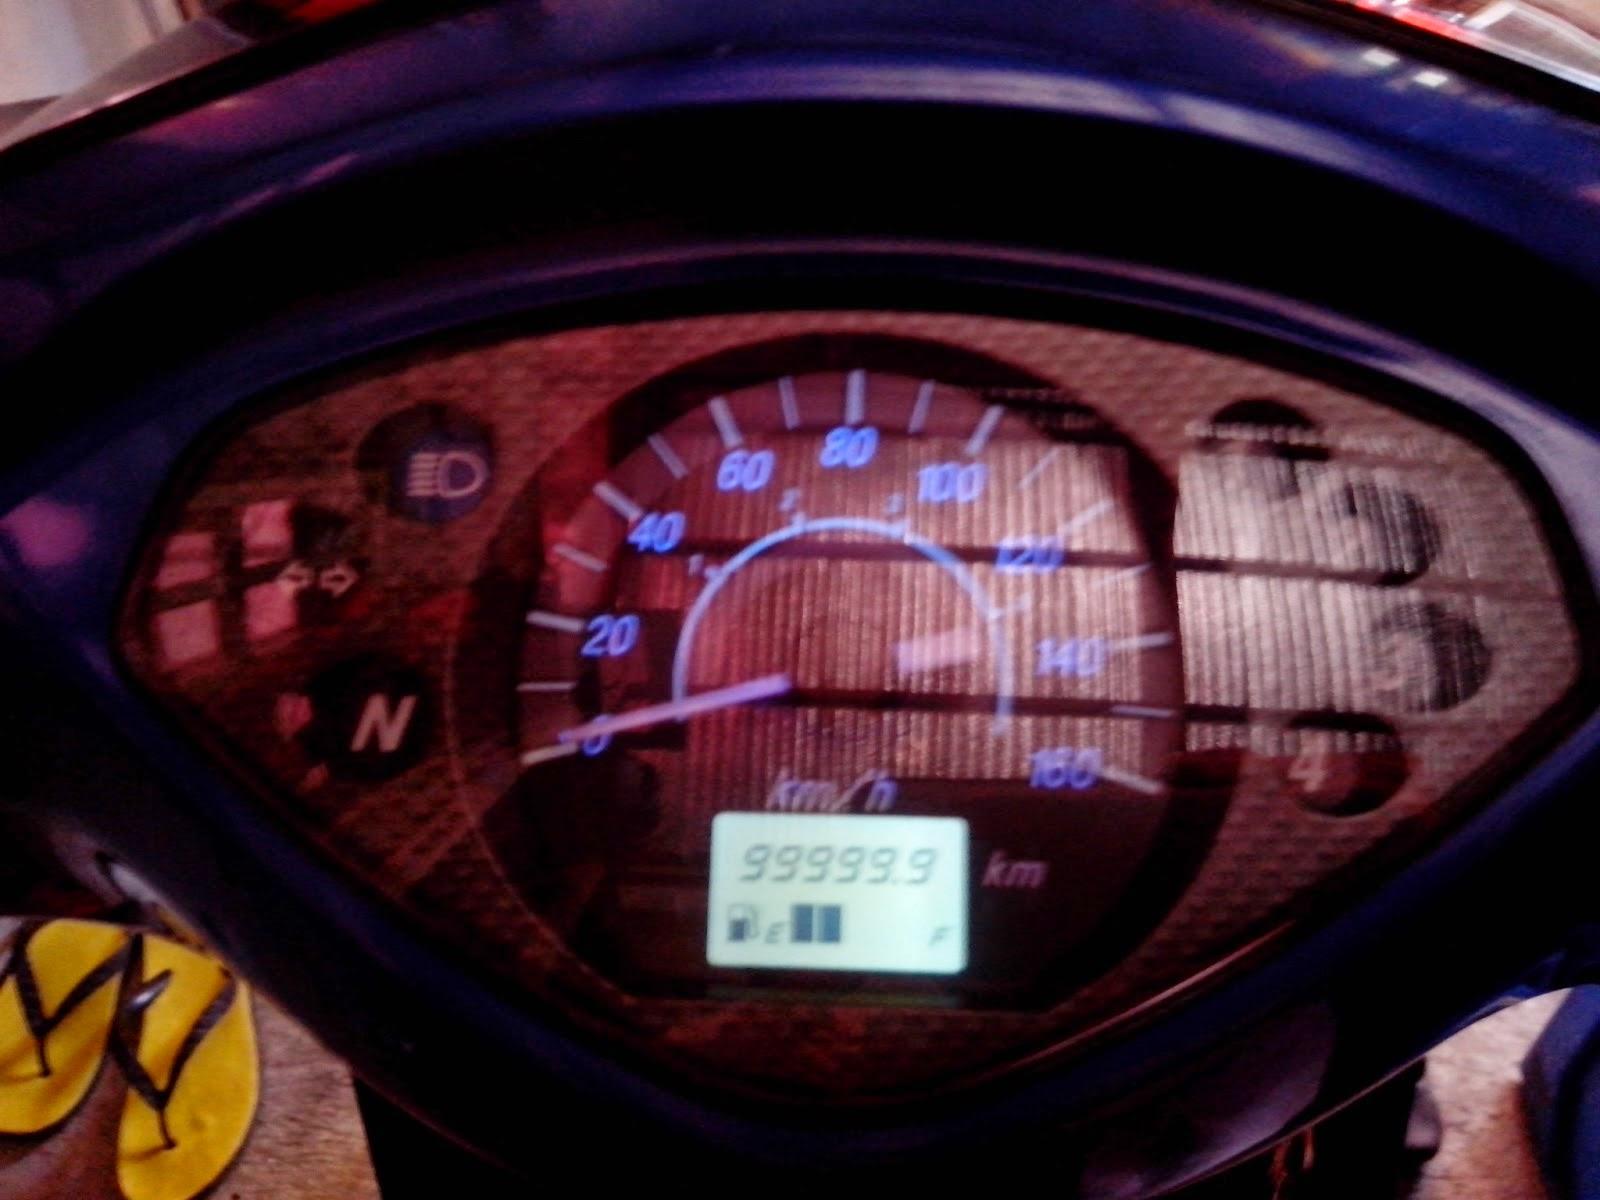 Wiring Diagram Honda Wave 125 : Digital fuel gauge lcd dsiplay techy at day blogger at noon and